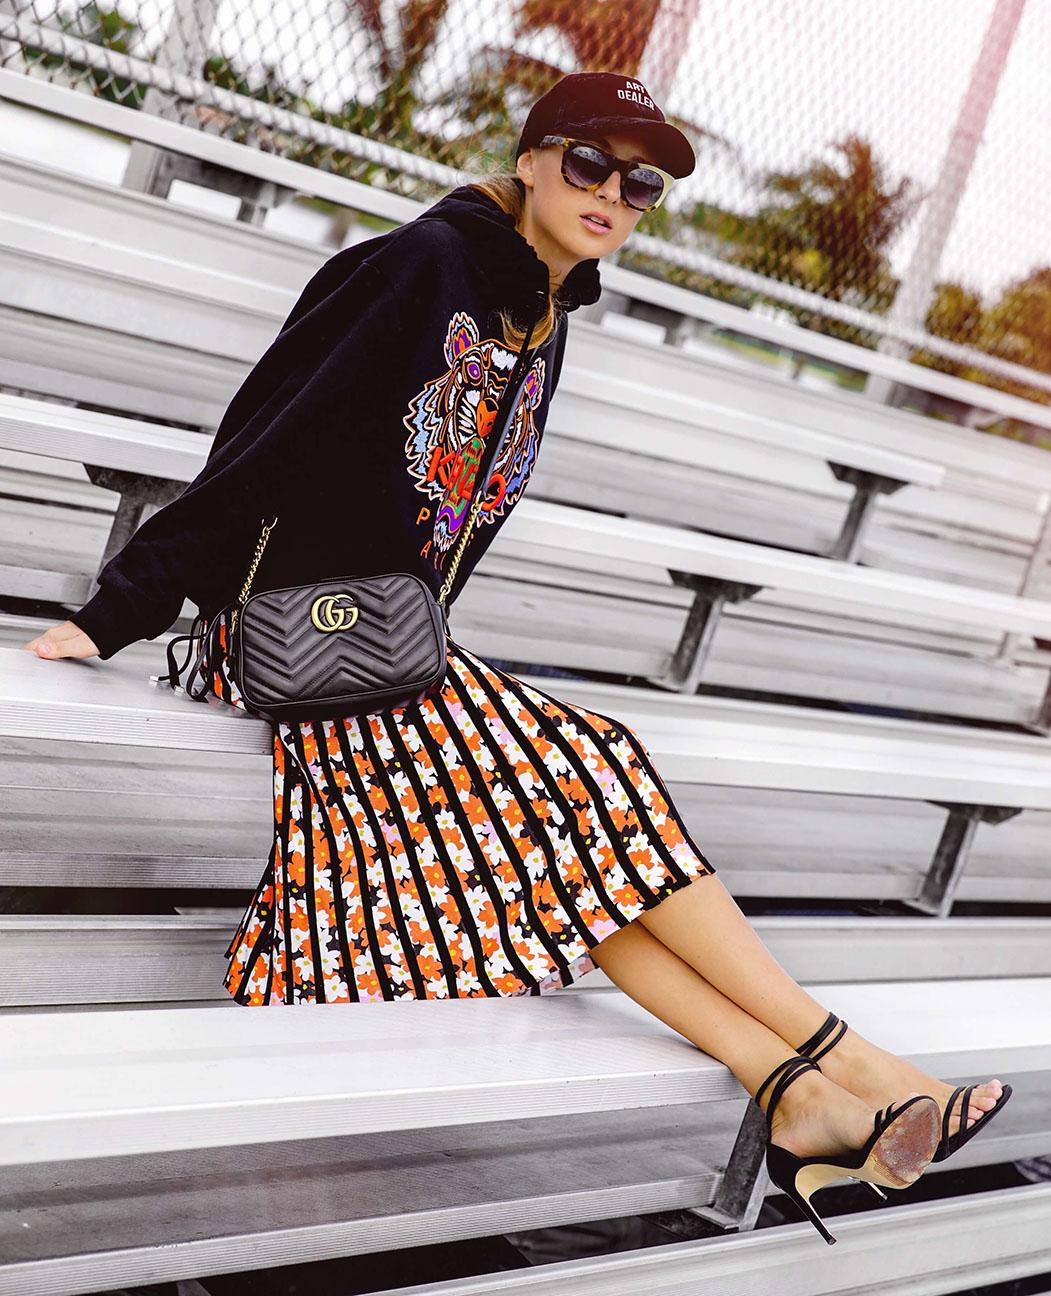 orange-midi-skirt-vertical-stripe-black-sweater-sweatshirt-hoodie-graphic-black-bag-blonde-sun-hat-cap-black-shoe-sandalh-fall-winter-lunch.jpg